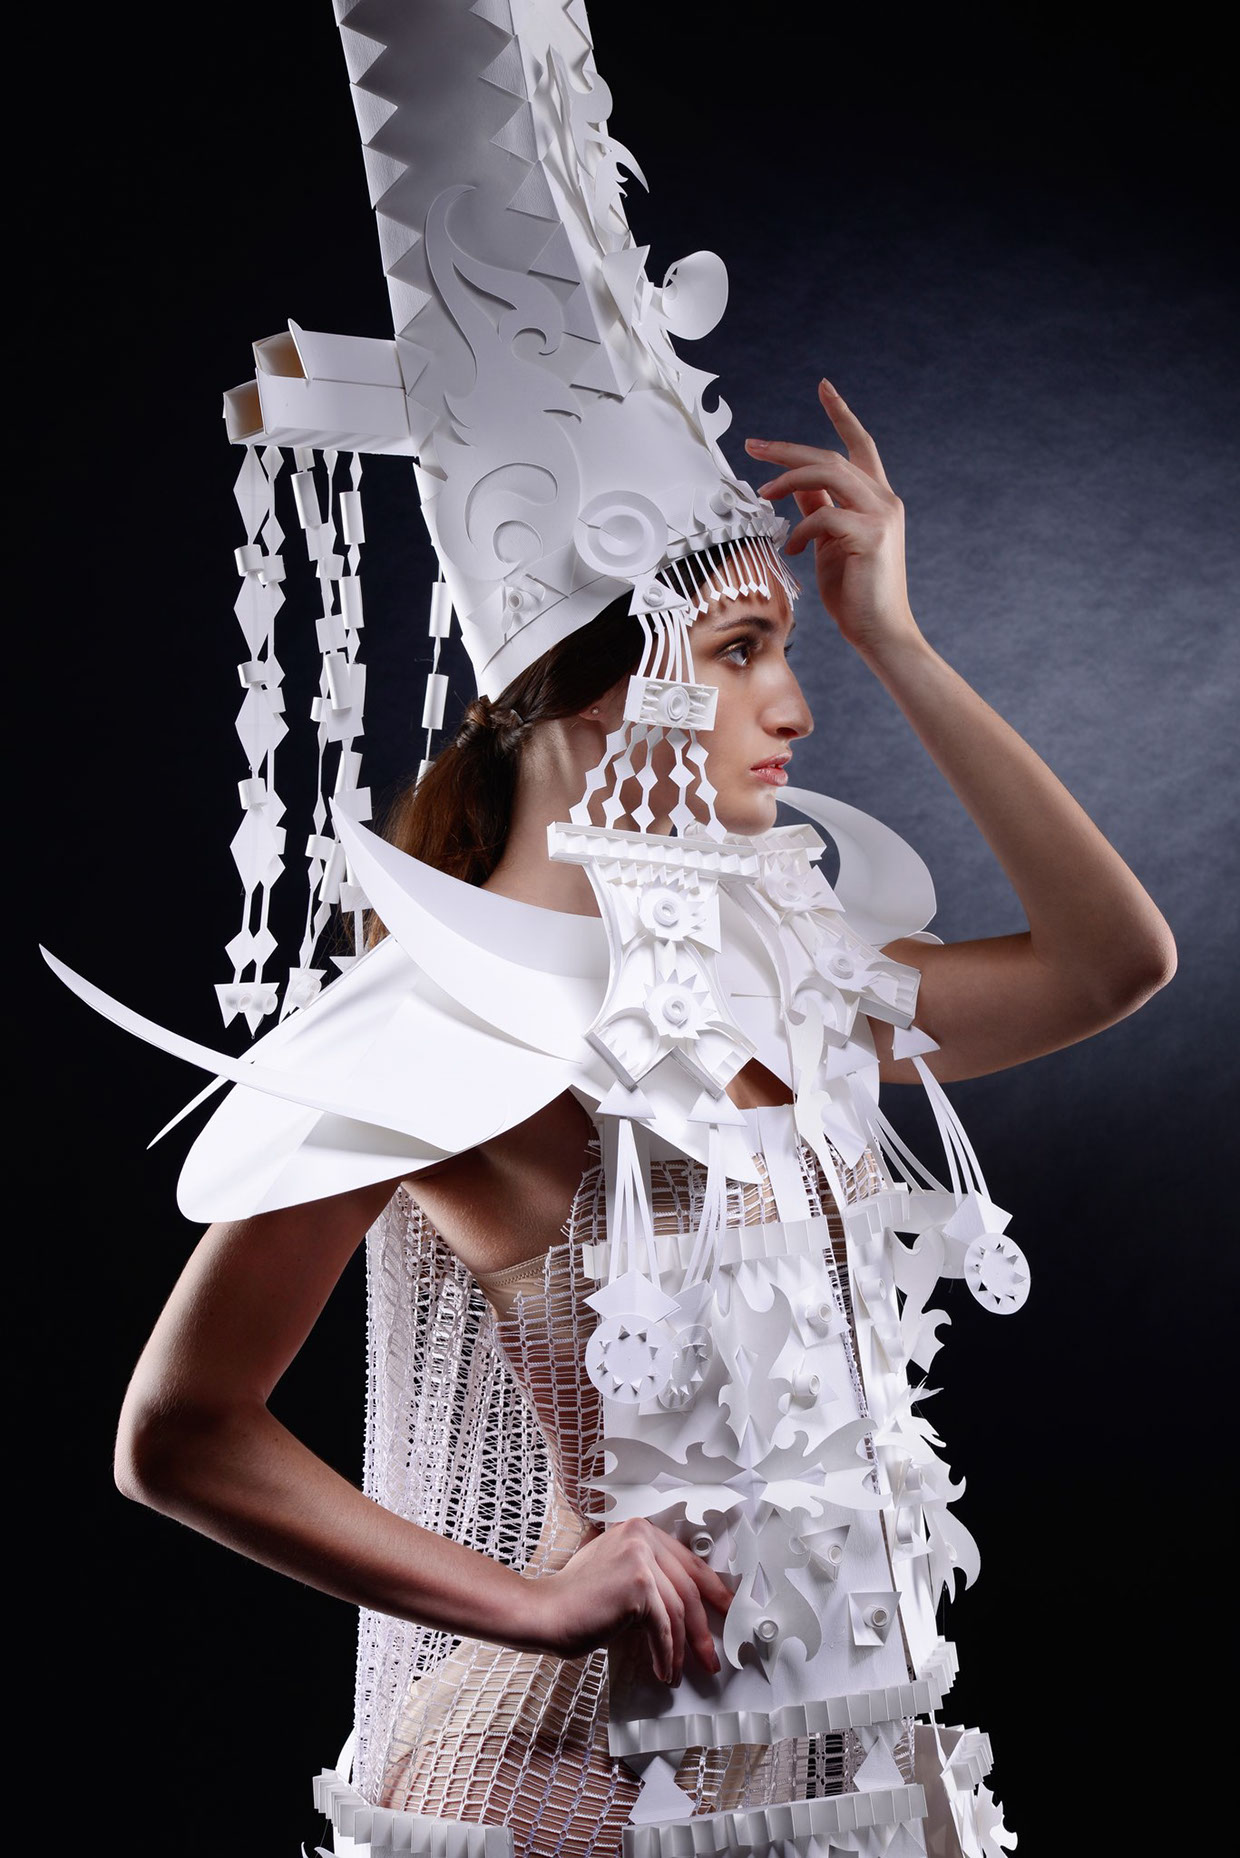 """Paper mongolian costumes"" paper artist: Asya Kozina photographer: Anastasia Andreeva makeup: Marina Sysolyatina model: Lily Abdurasulova, Olga Komarova, Pauline Krasavina"